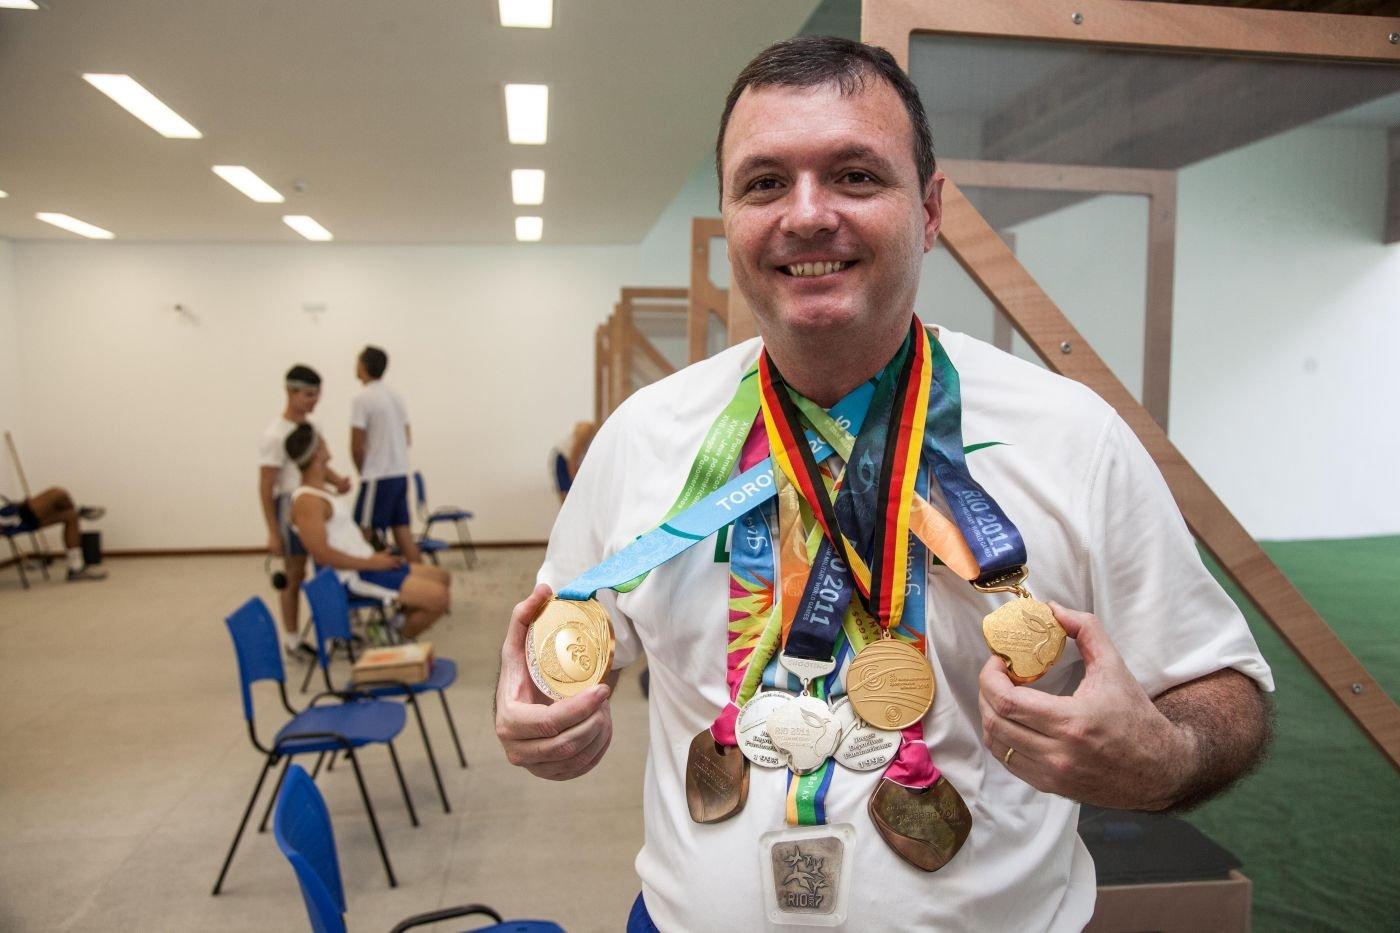 Brazilian Military Athletes Eye Medal Success at 2016 Rio Olympics